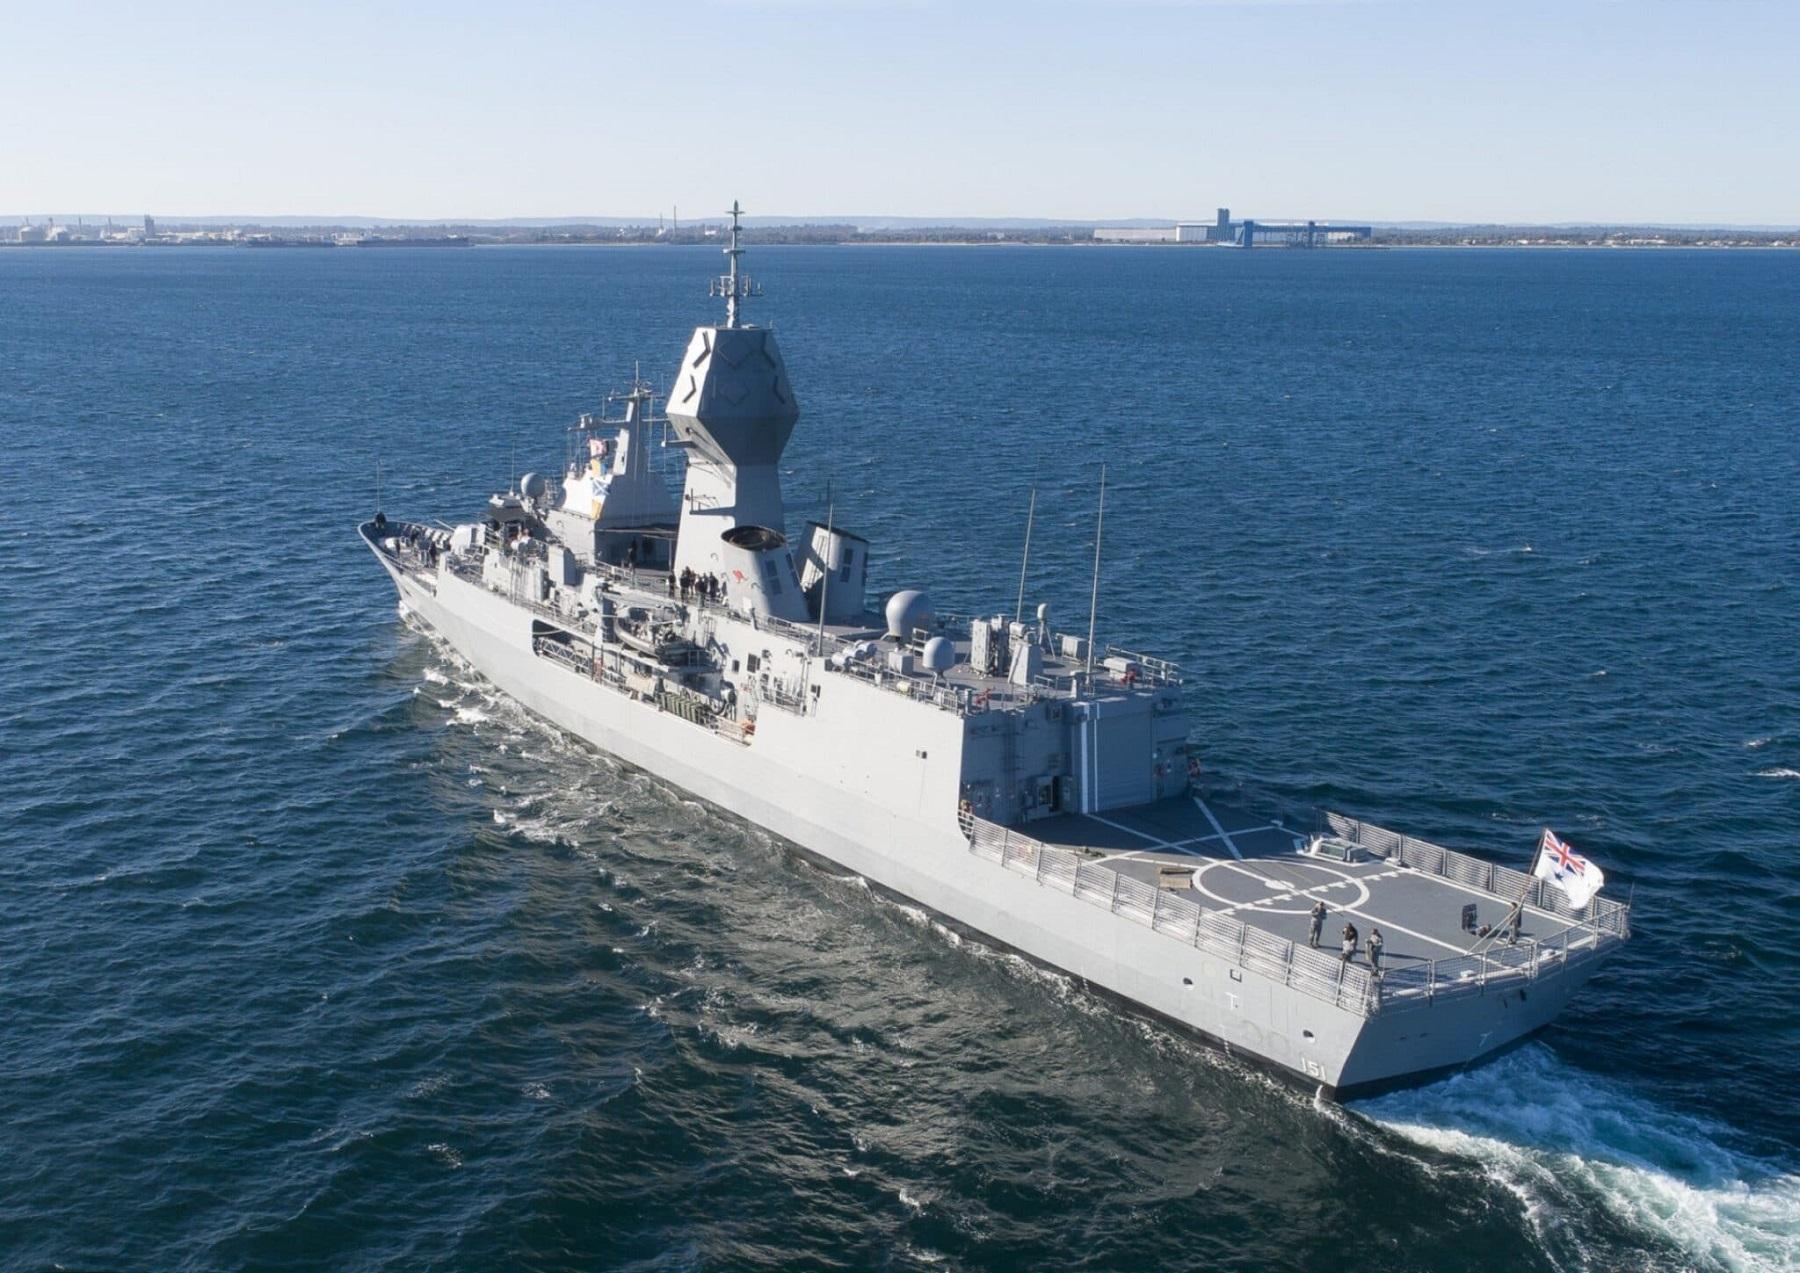 HMAS Arunta (FFH 151) Frigate (Photo by Royal Australian Navy)